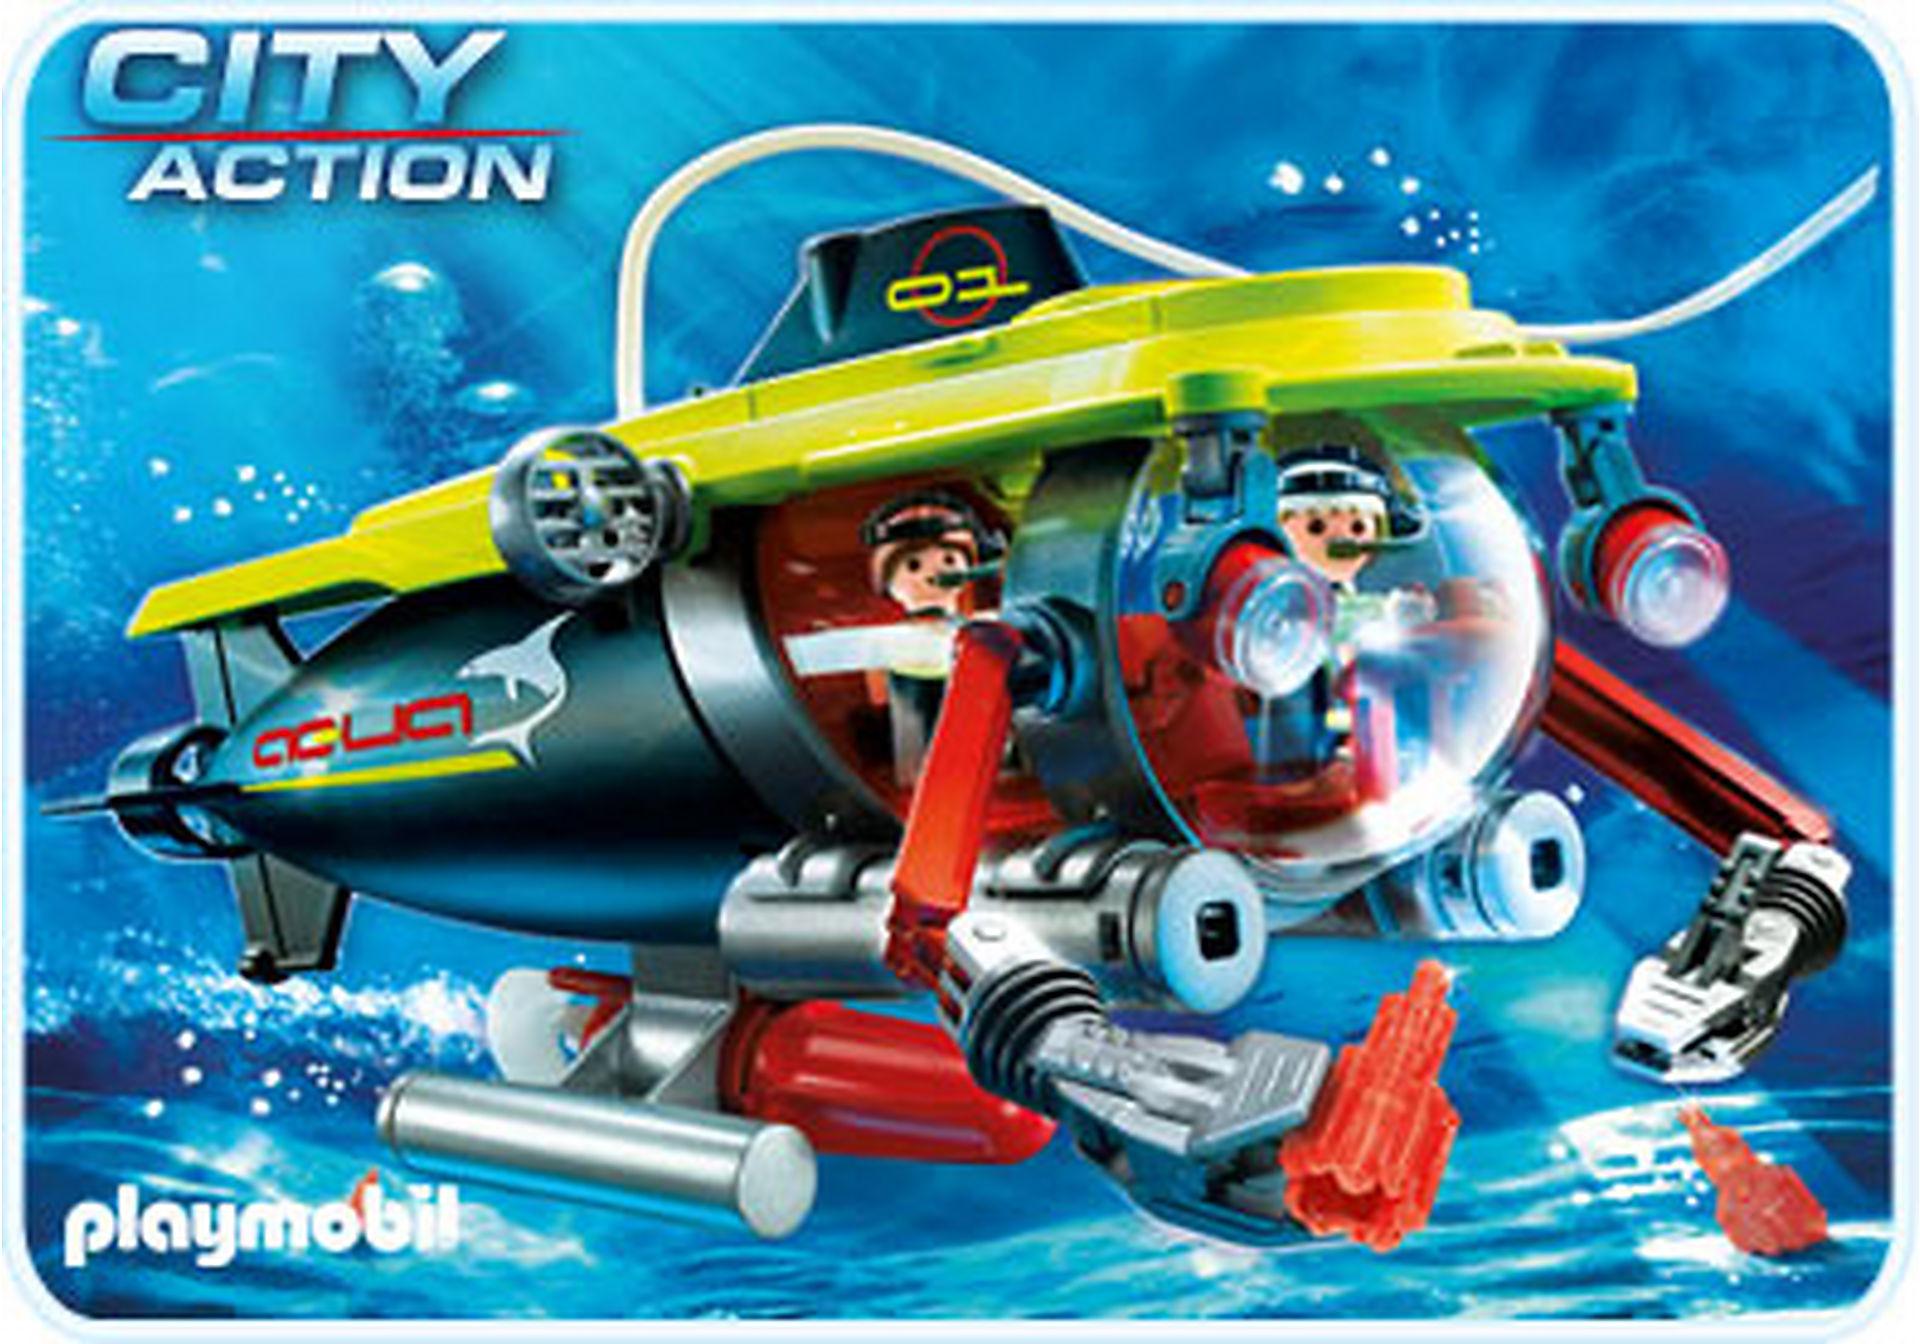 http://media.playmobil.com/i/playmobil/4909-A_product_detail/Tiefsee-Tauchboot mit Unterwassermotor